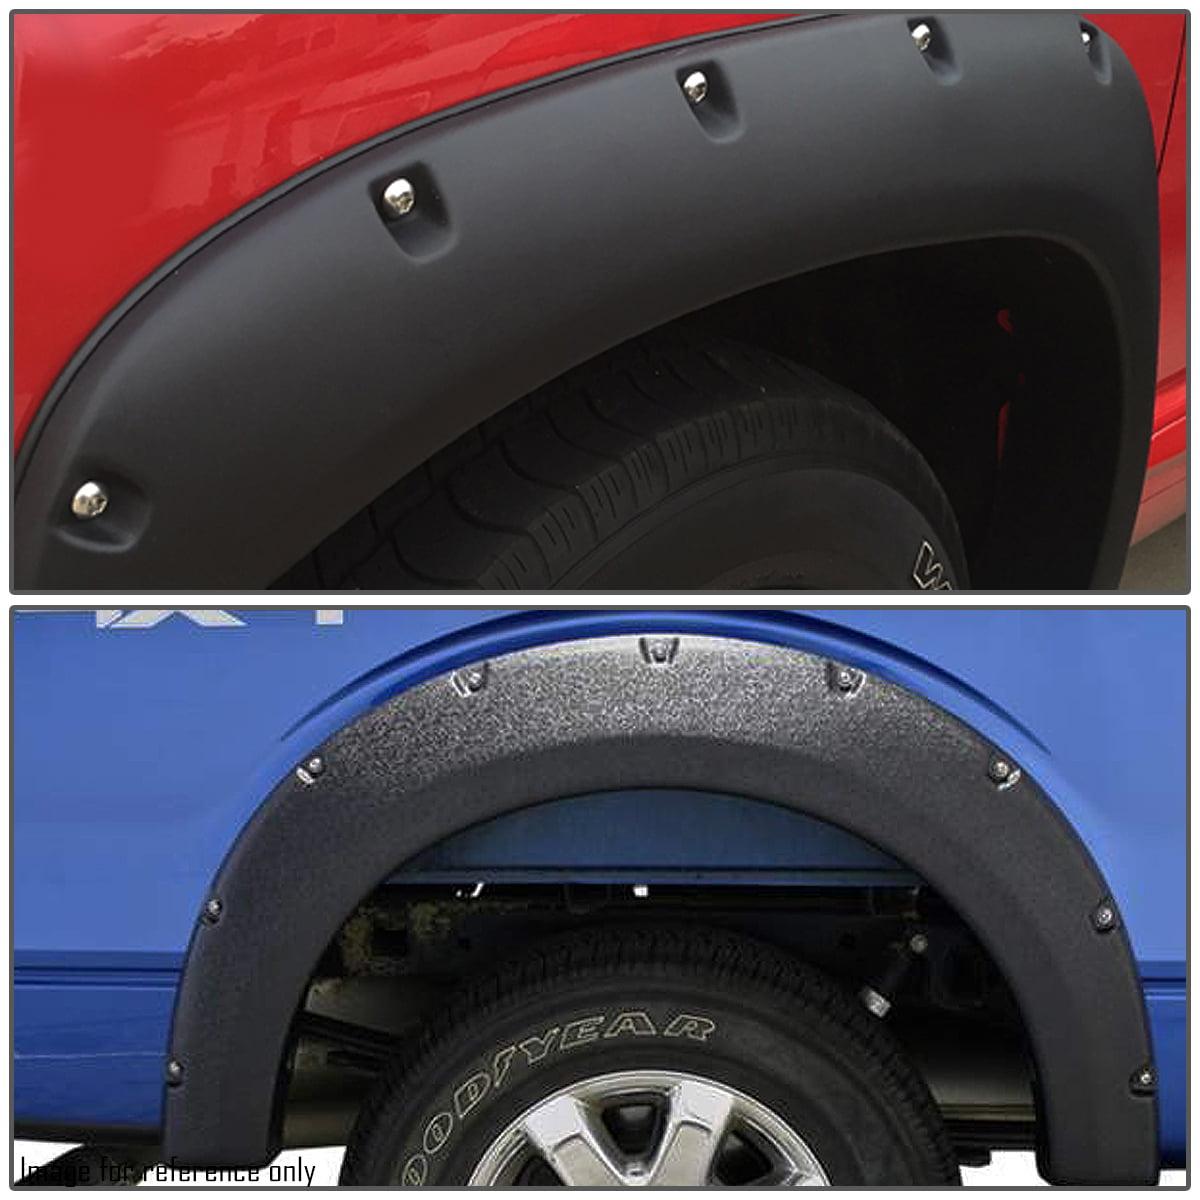 Black For Dodge Ram Grain Textured Pocket-Riveted Style Side Fender//Cover//Protector Wheel Flares 3rd gen